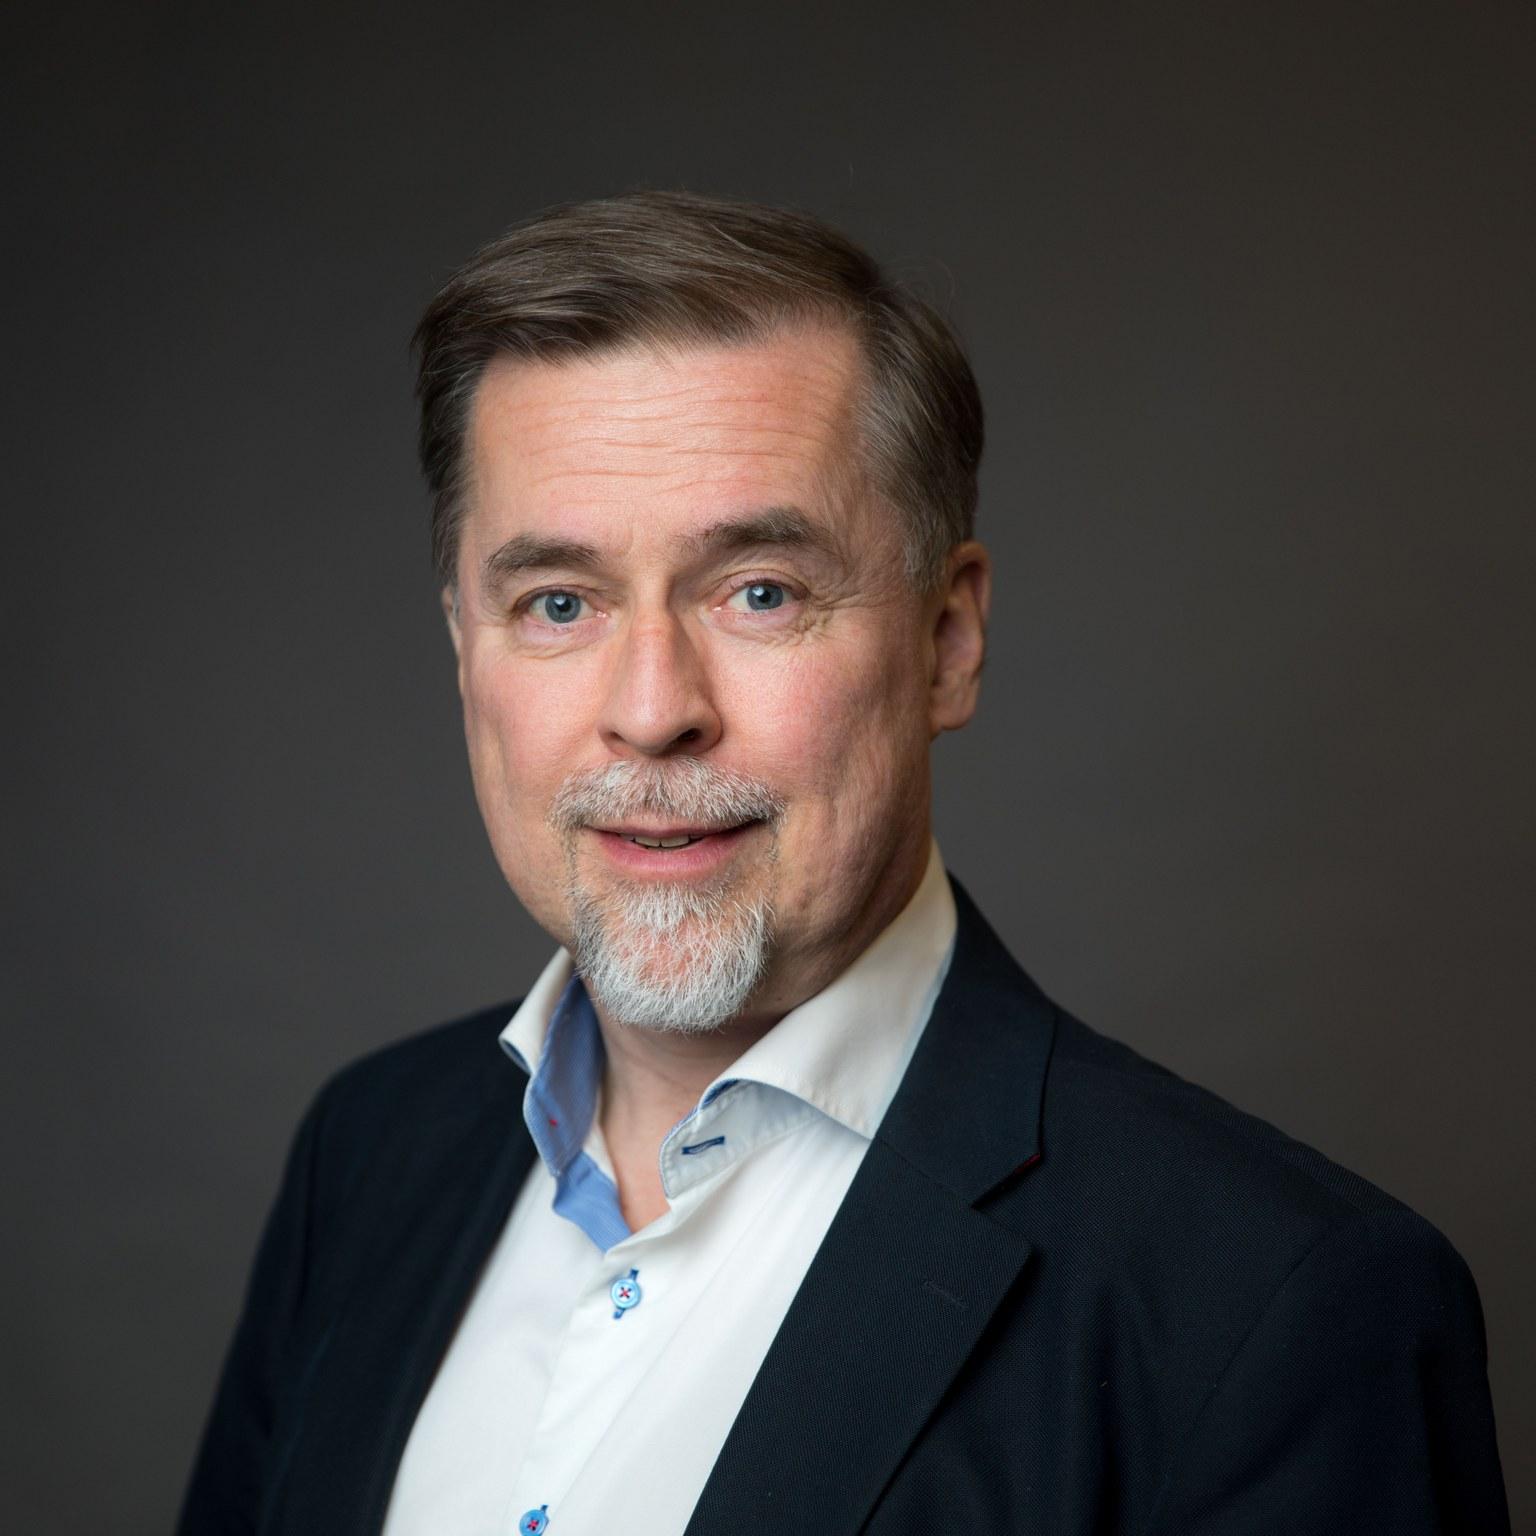 Juhani Talvela